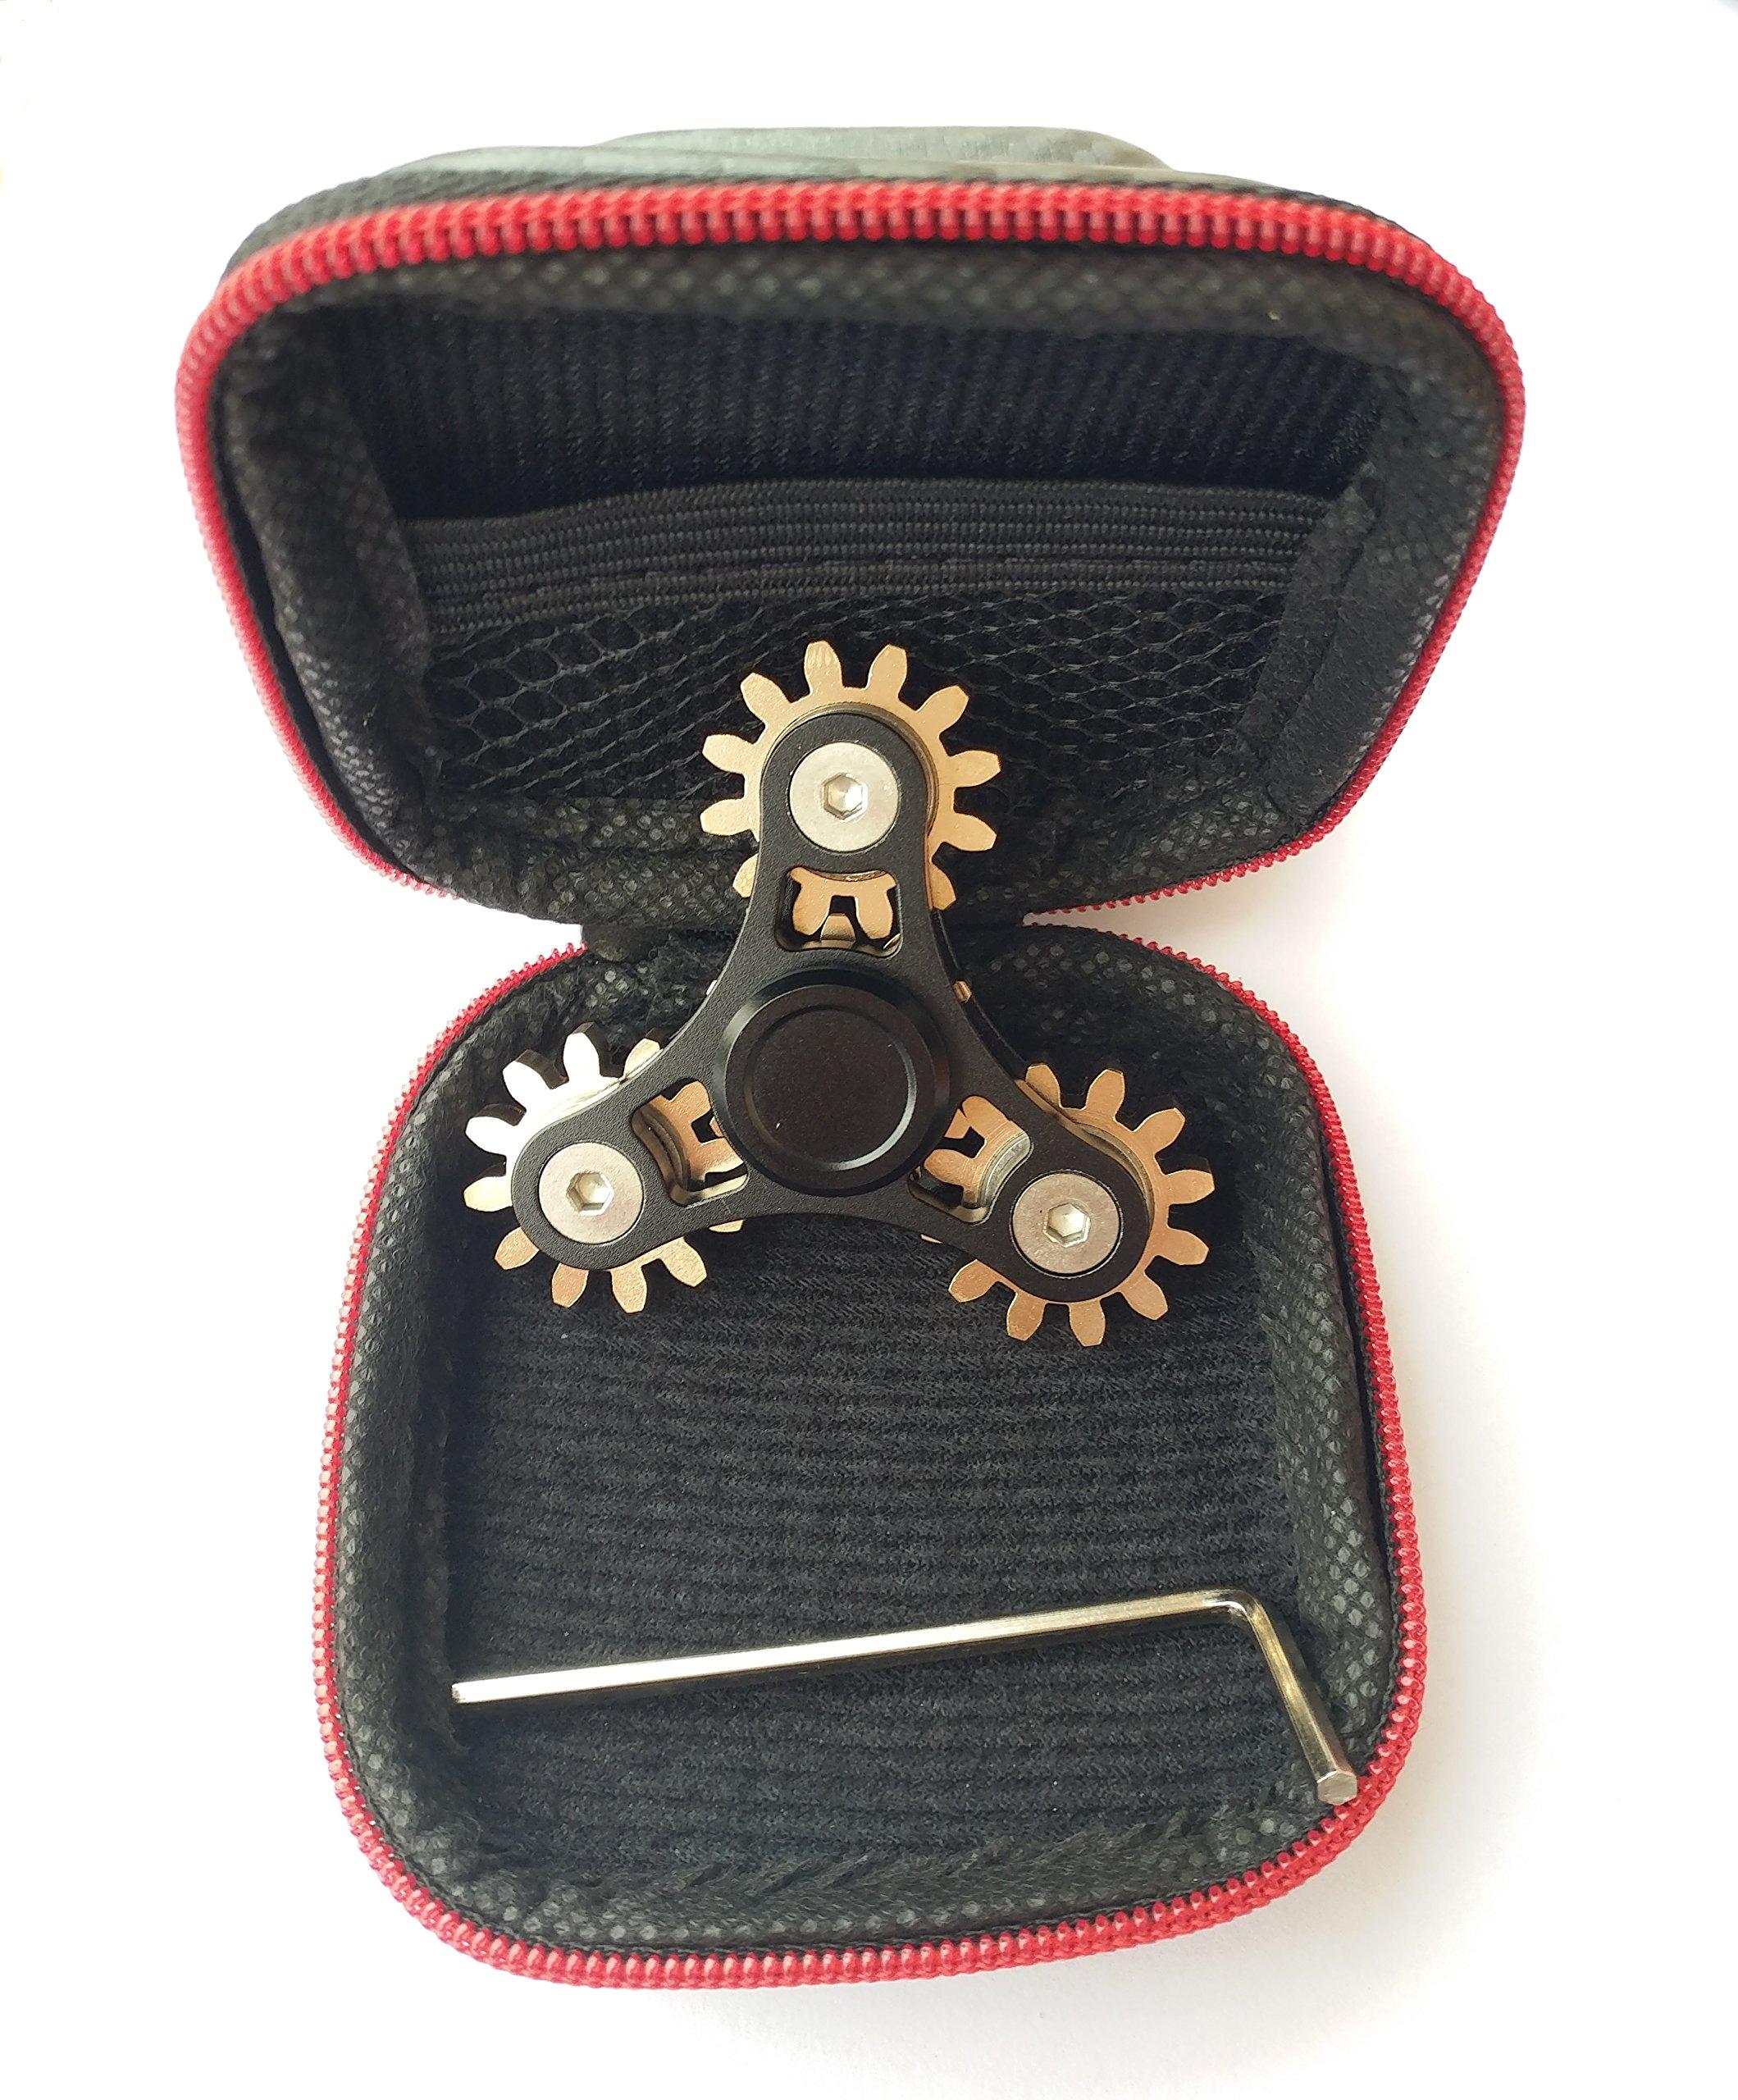 DoDoMagxanadu 4 Gear Fidget Spinner Metal Brass Linkage Metal Gear Hand Spinner Fidget Toy Relievers Stress and Anxiety Anti Depression Toy by DoDoMagxanadu (Image #6)